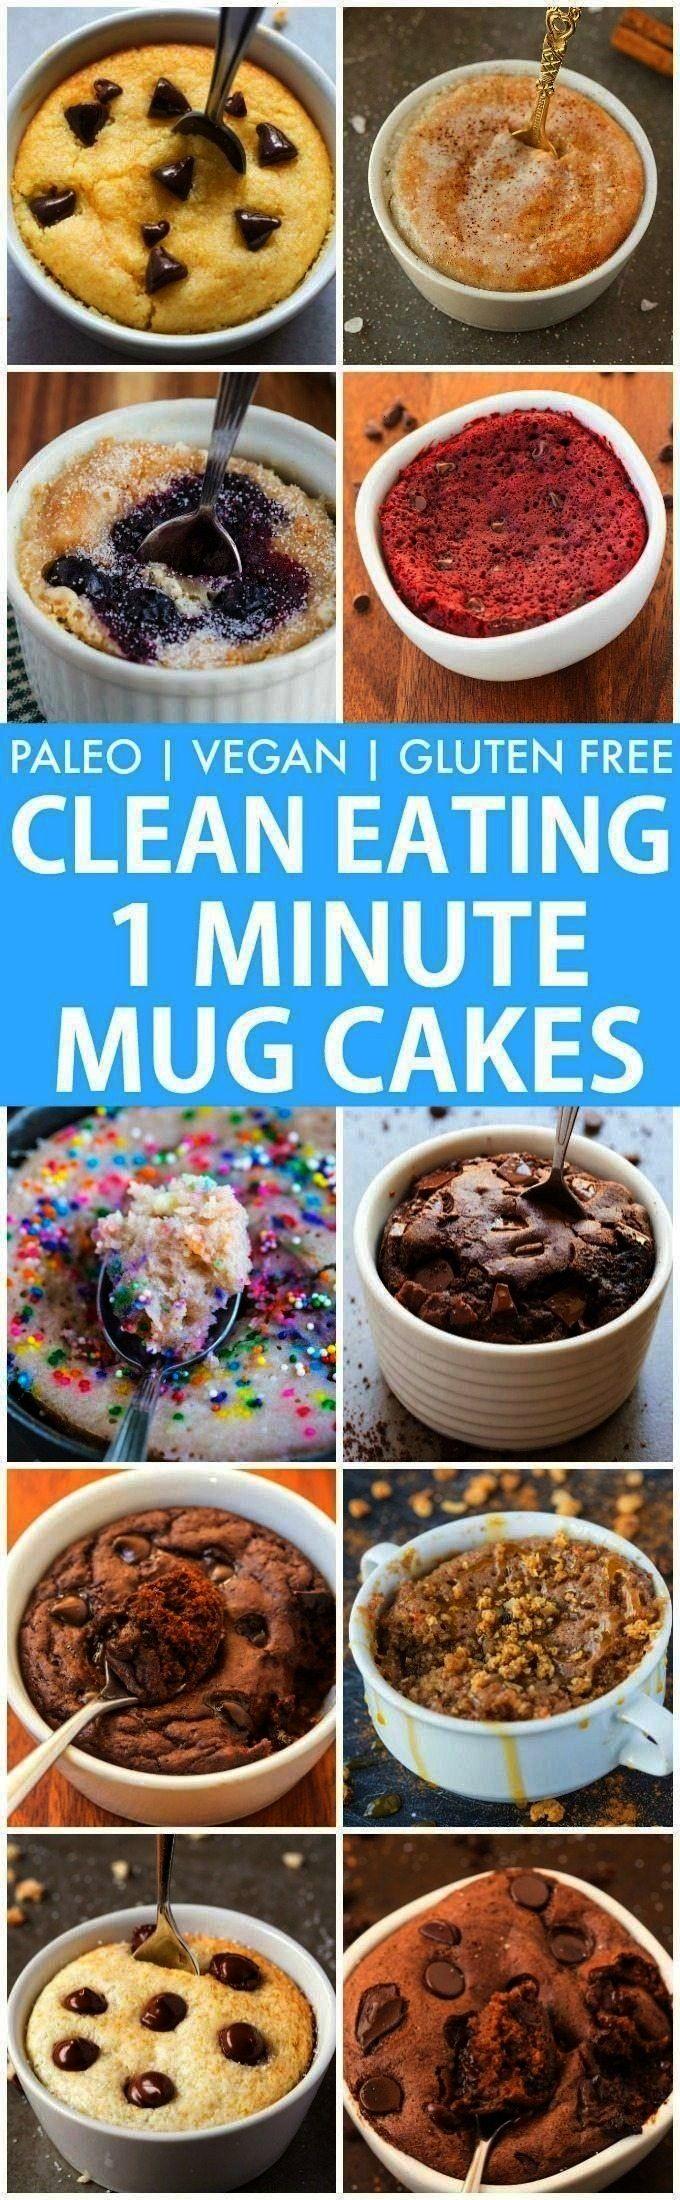 1 Minute Mug Cakes, Brownies and Muffins (V, GF, Paleo)- De... Clean Eating Healthy 1 Minute Mug Ca